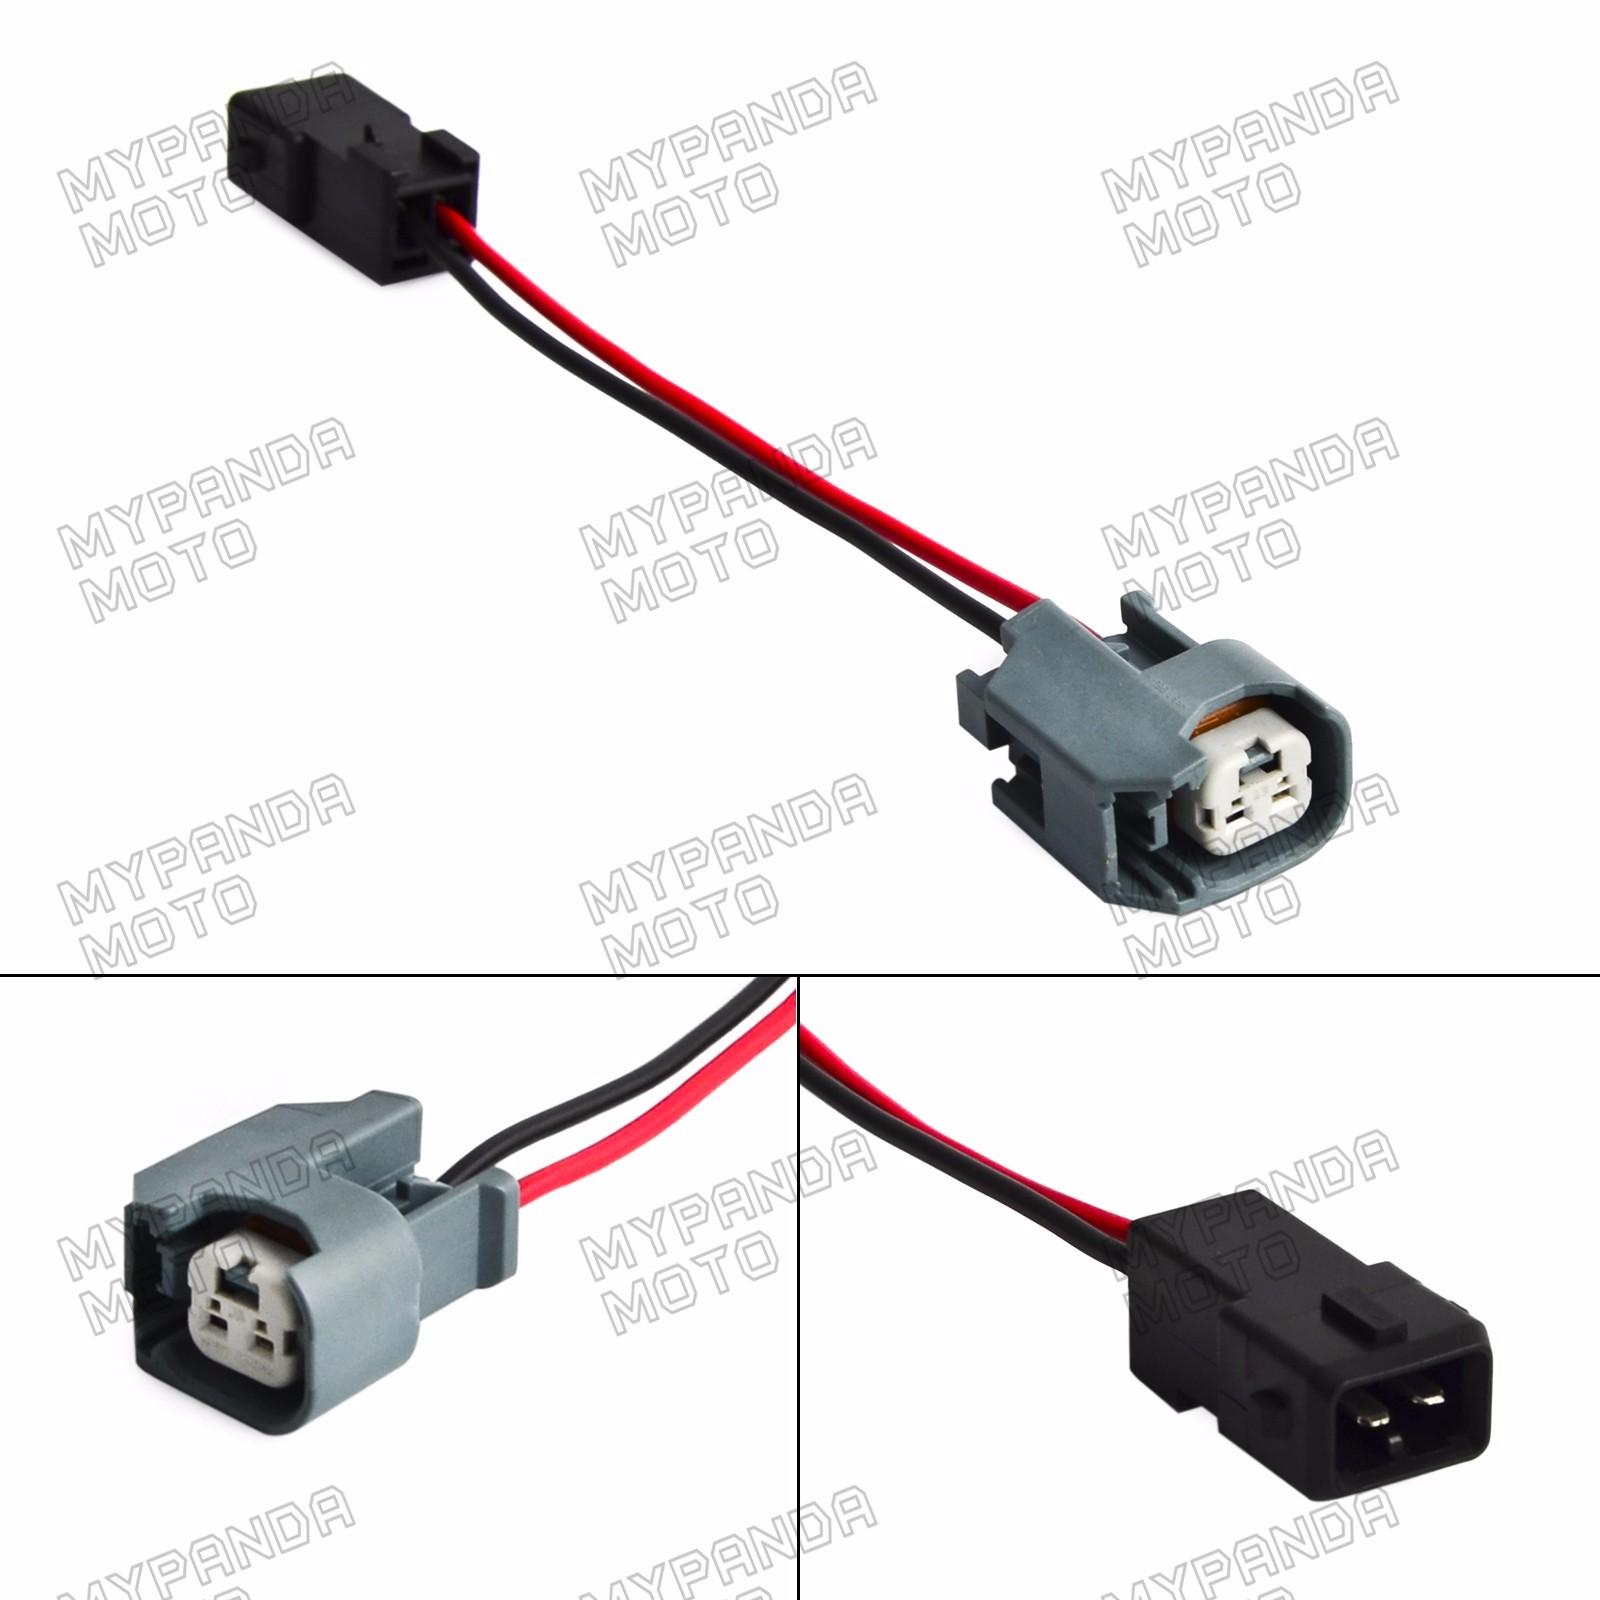 8-LS1 LS6 LT1 EV1 Engine Wire Harness to LS2 LS3 LS7 EV6 Injector Adapter  Fuel